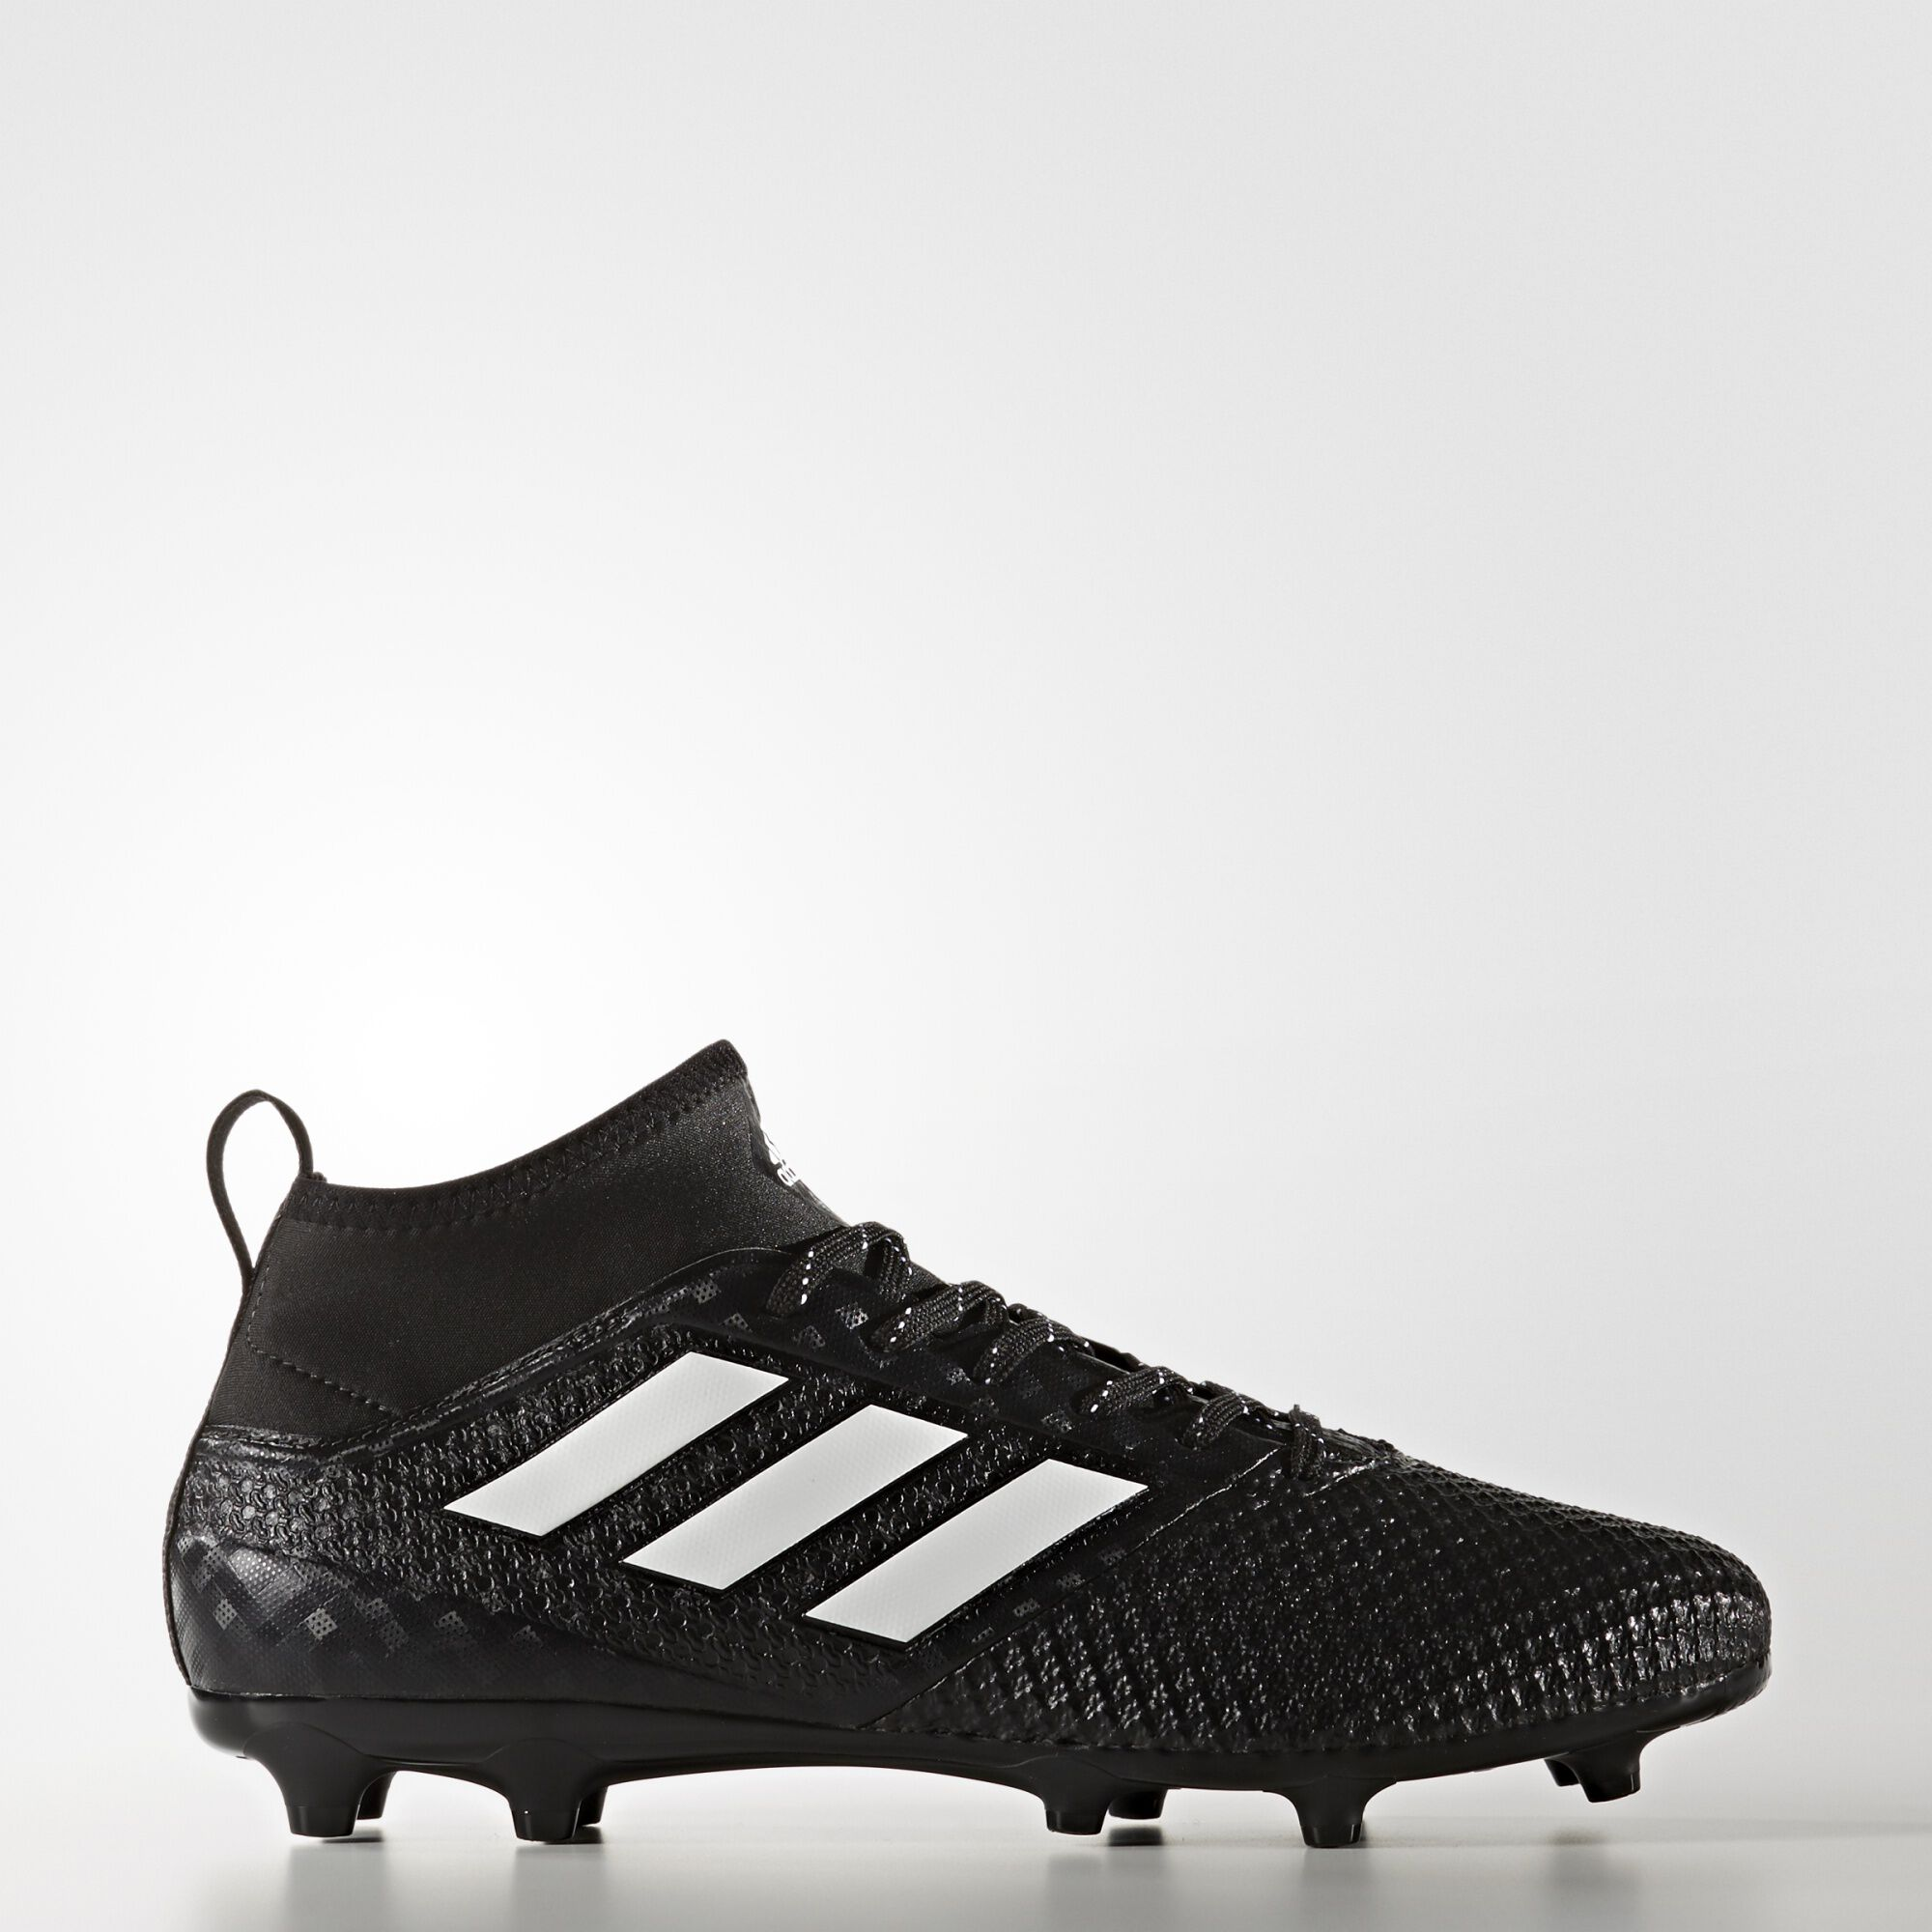 Adidas Ace 17.3 Black